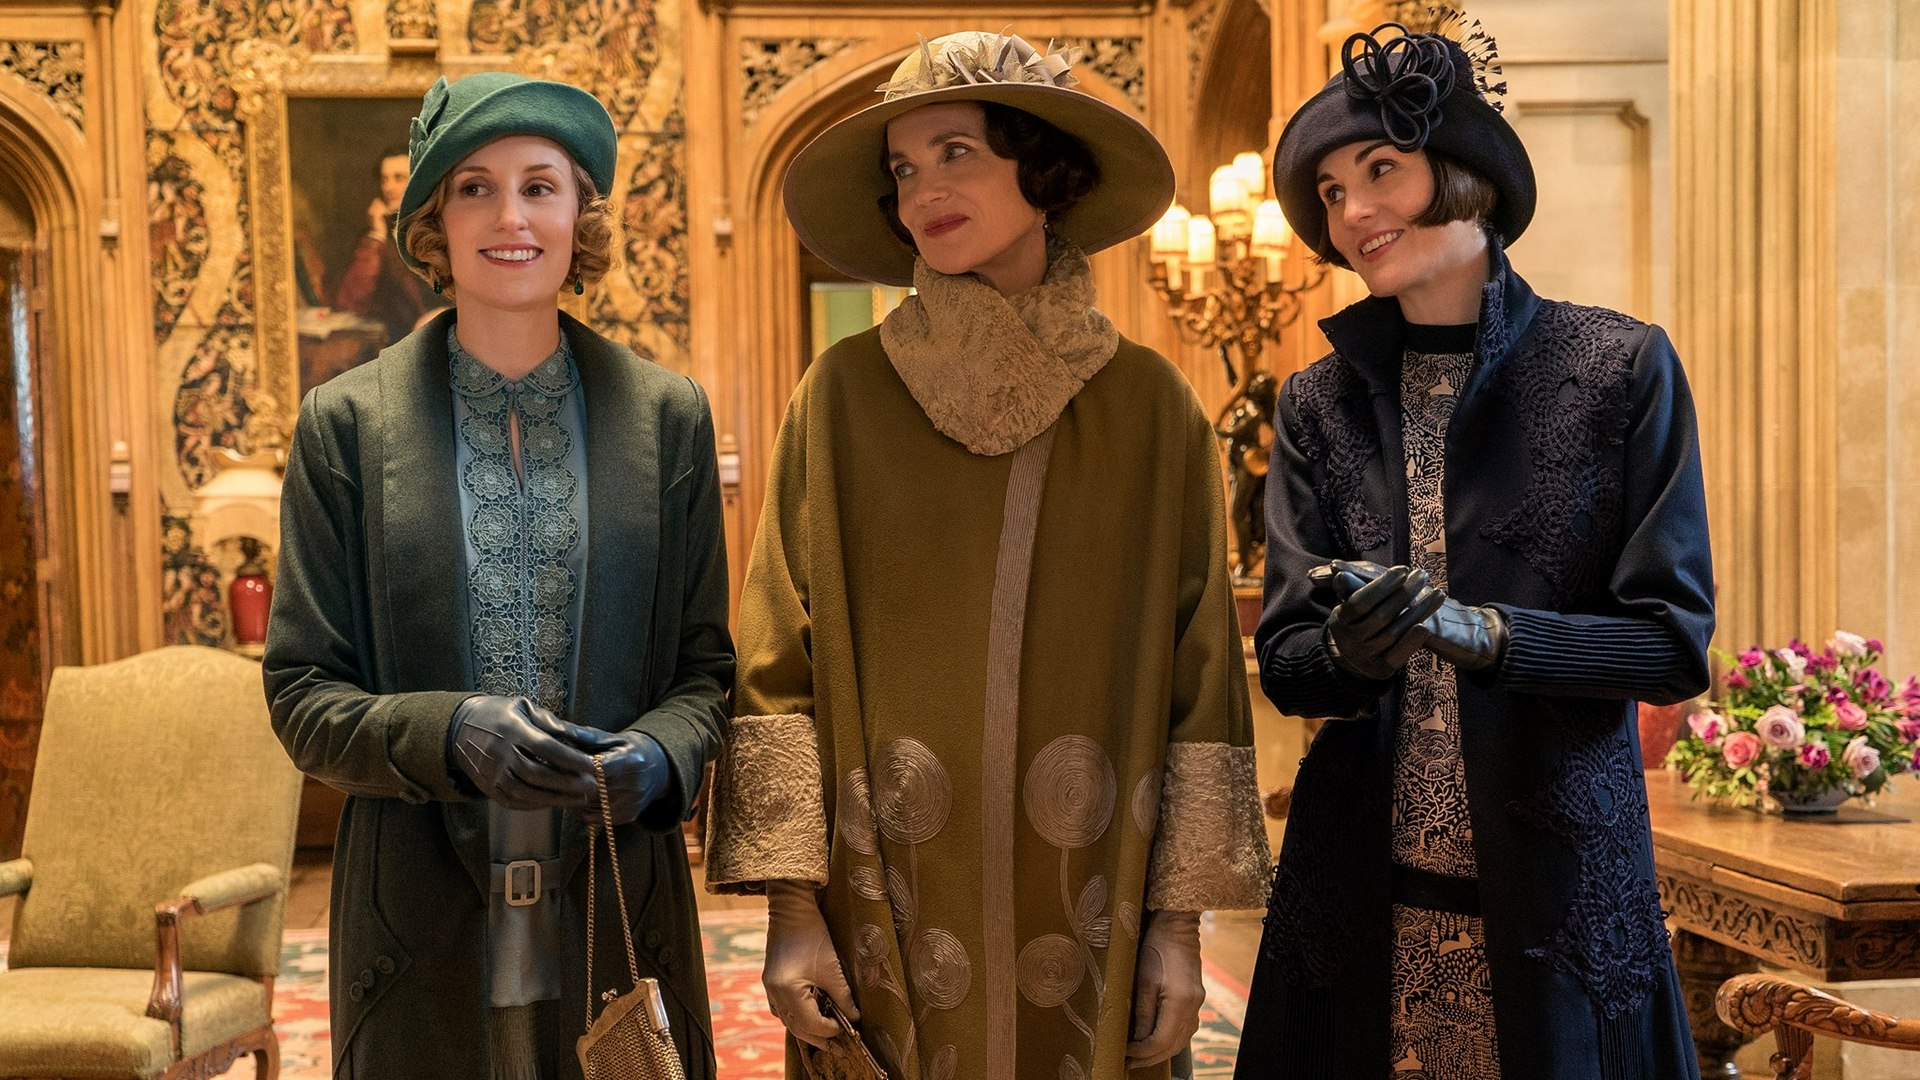 Snima se Downton Abbey 2 | Film dolazi u kina za zimske blagdane